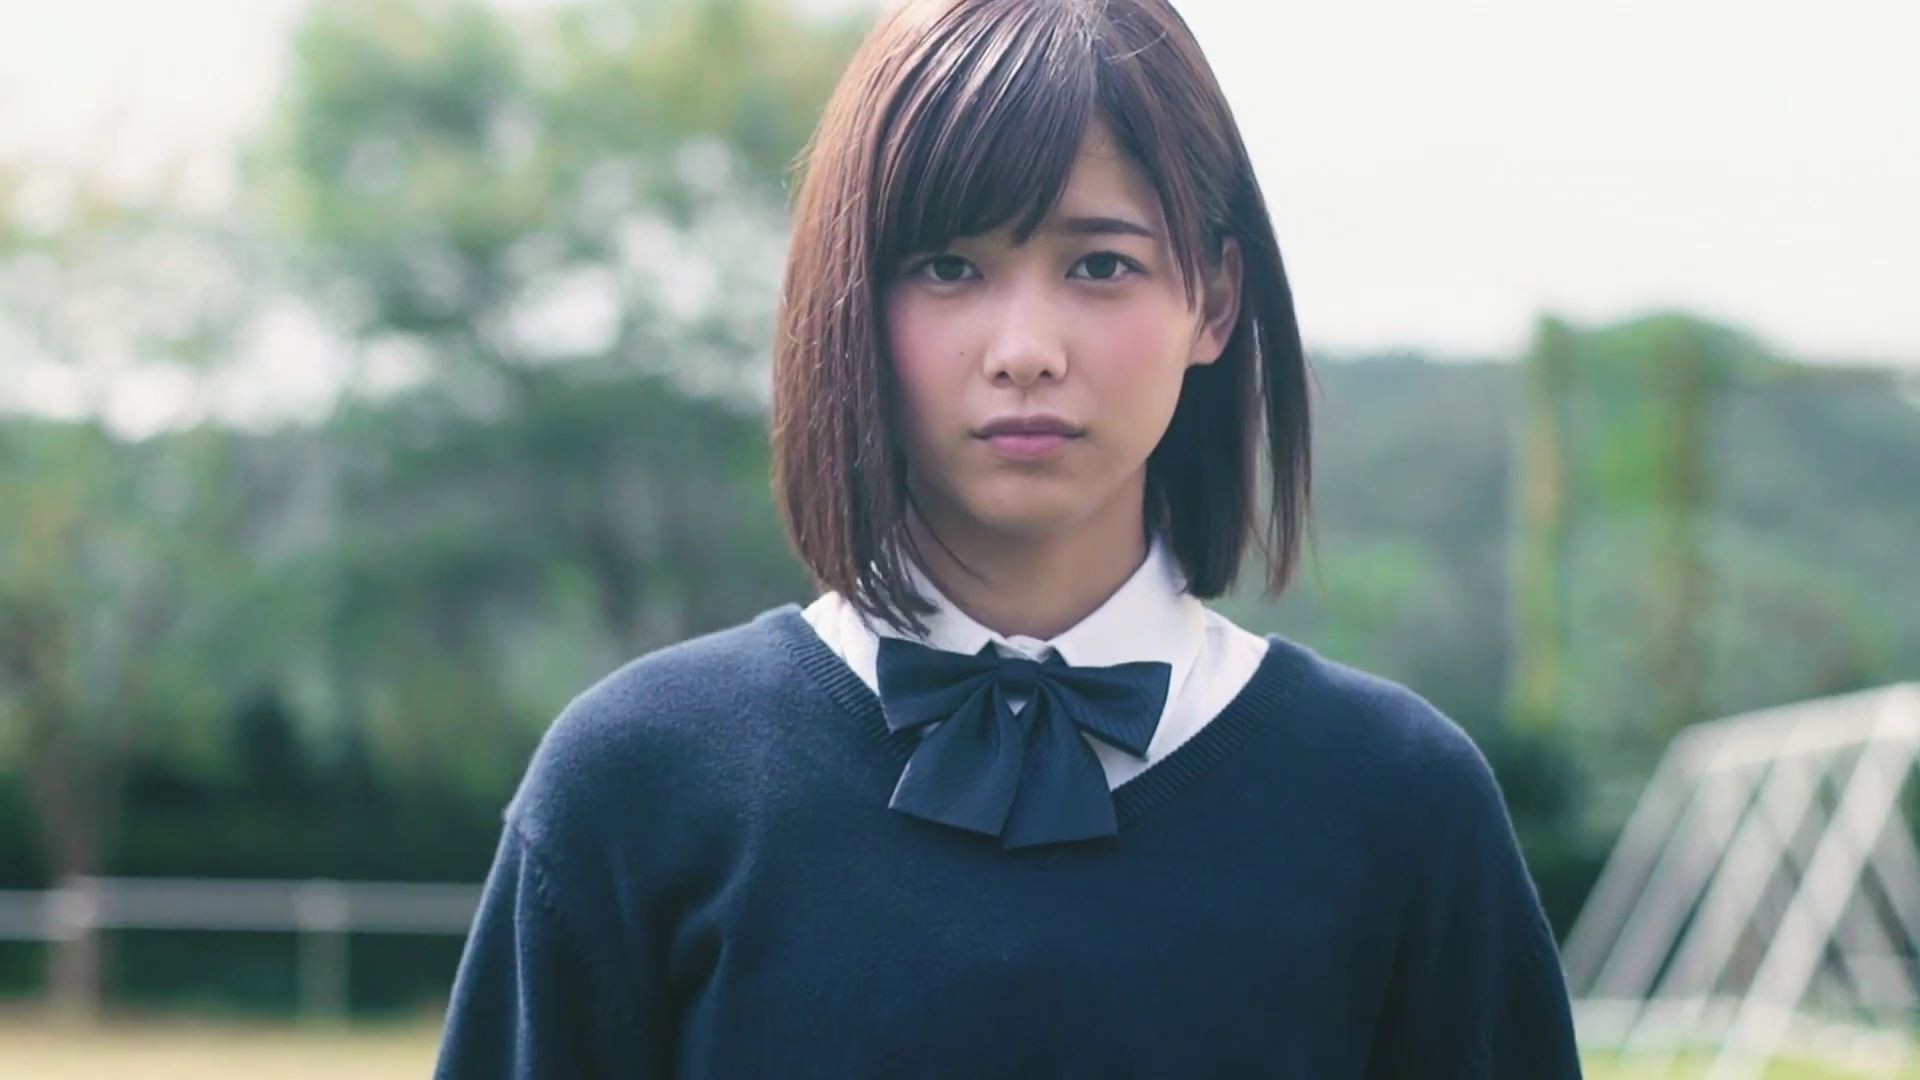 STUのセンター・瀧野由美子の初グラビアが凄い!©2ch.netYouTube動画>1本 ->画像>100枚